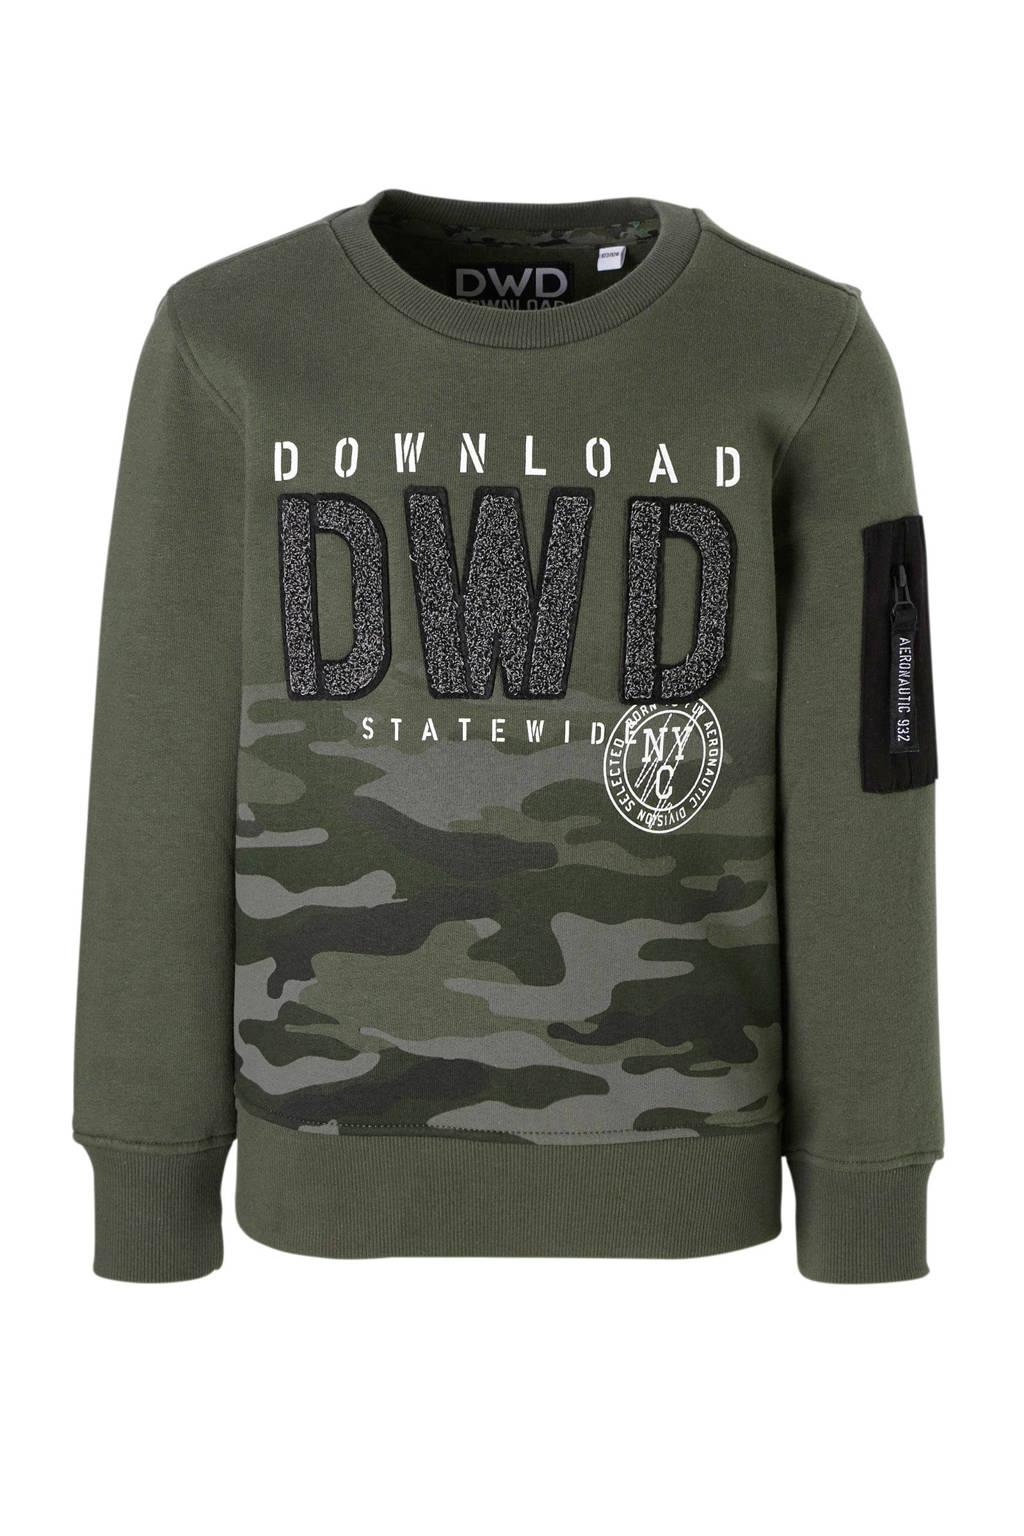 C&A Here & There sweater met camouflageprint groen, Legergroen/zwart